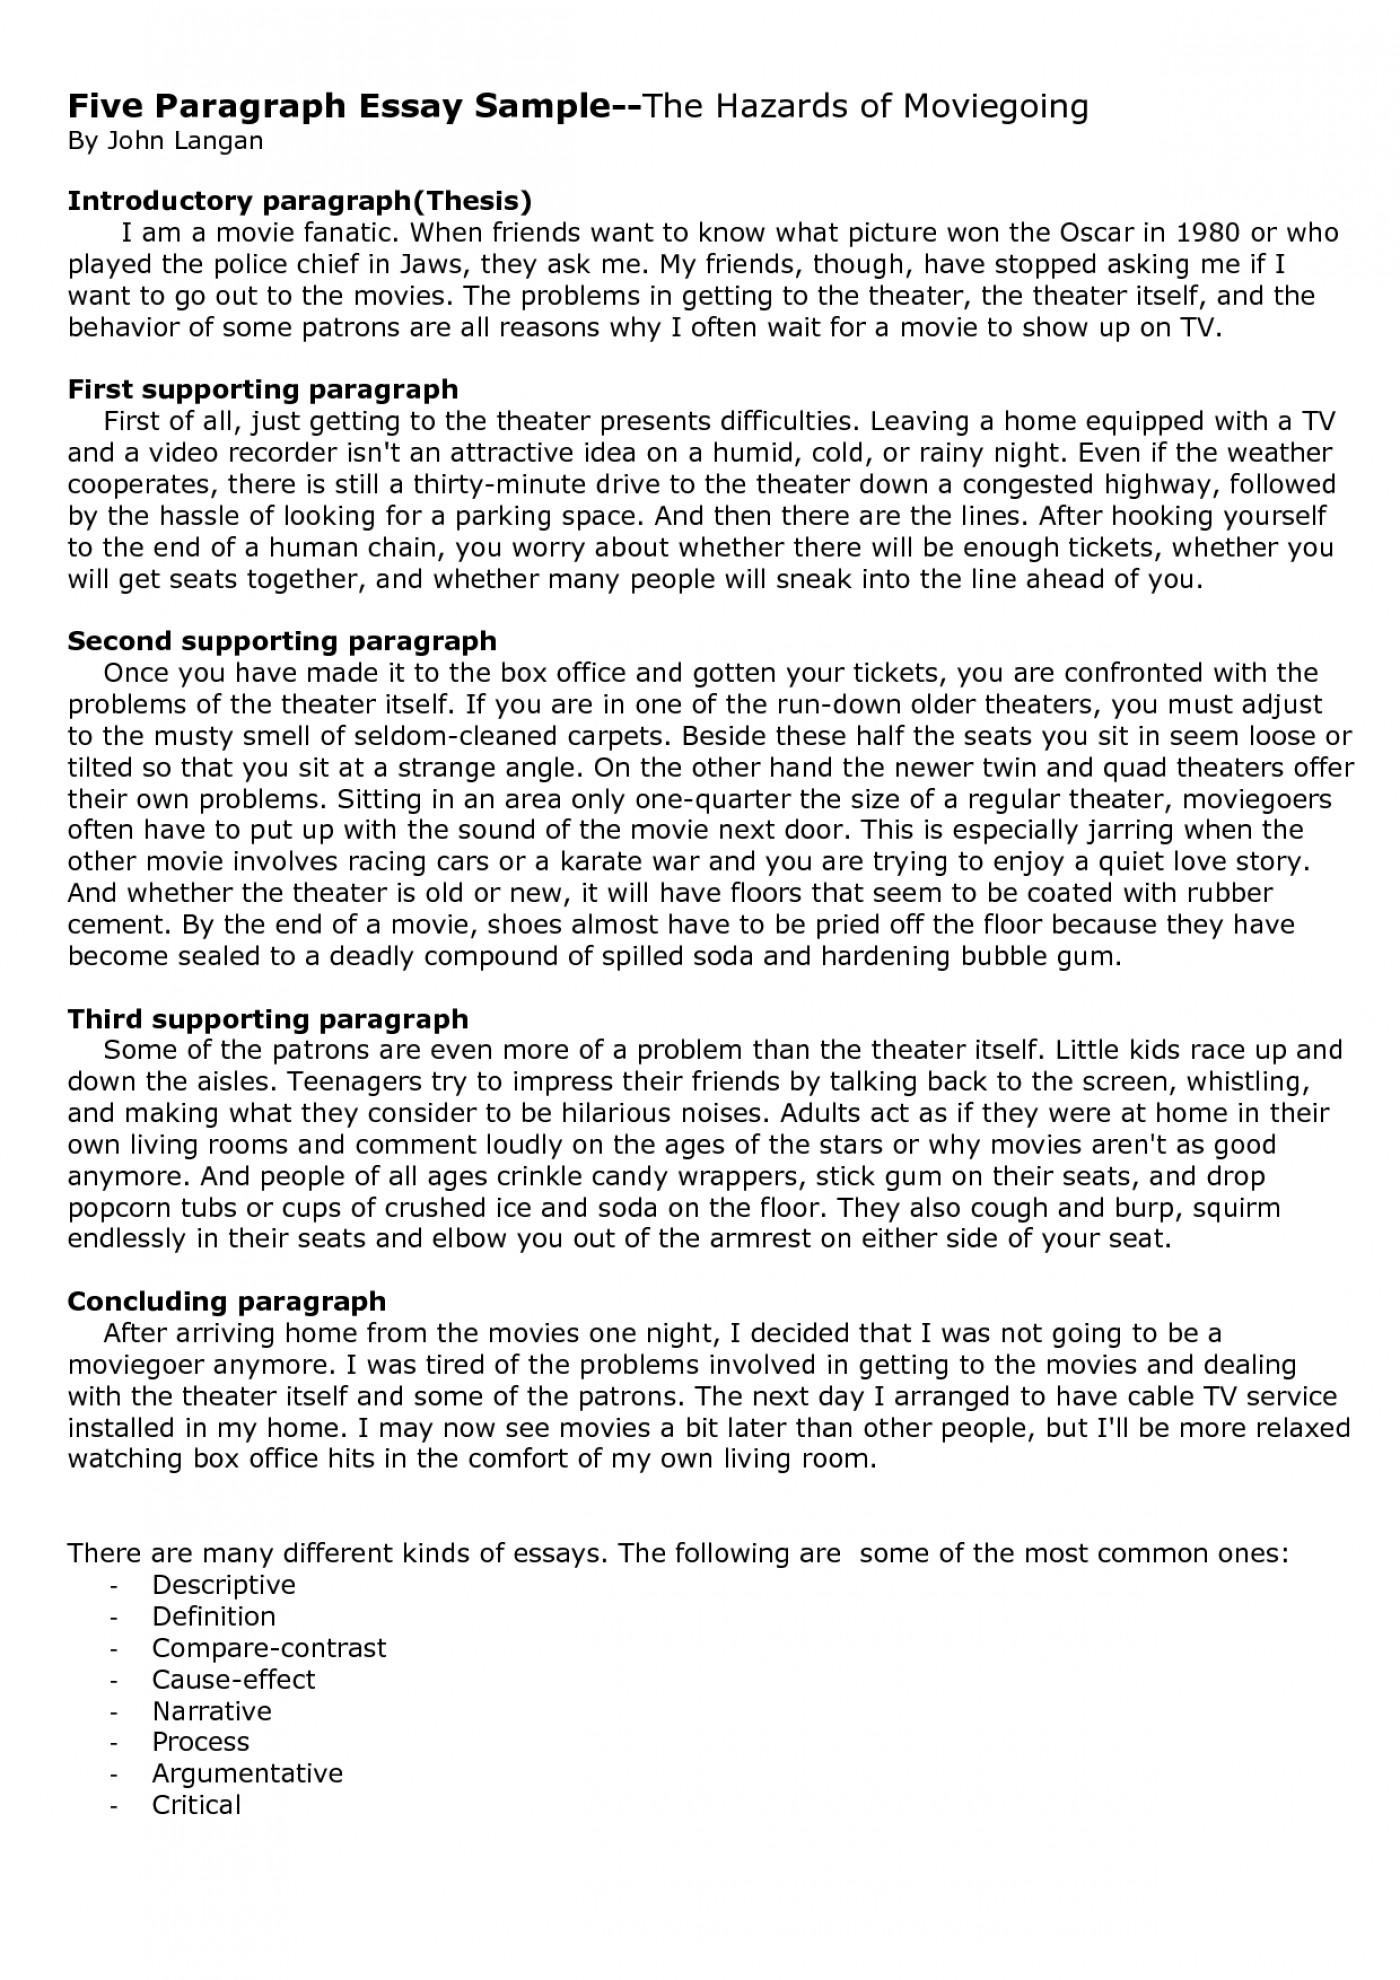 003 U2shuebtjf Paragraph Essay Example Excellent 5 College Pdf 1400